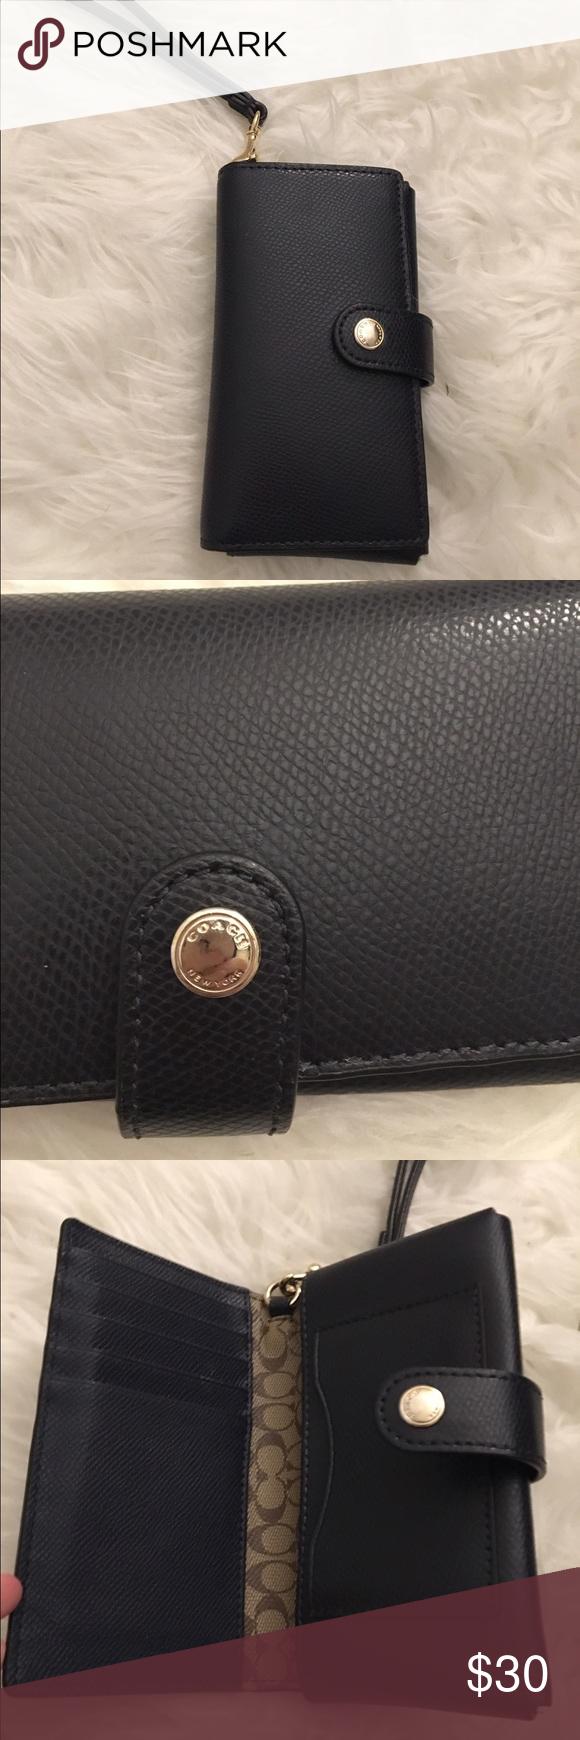 Genuine Navy blue leather coach wristlet/wallet Cute, gently used Coach wallet/wristlet Coach Bags Wallets